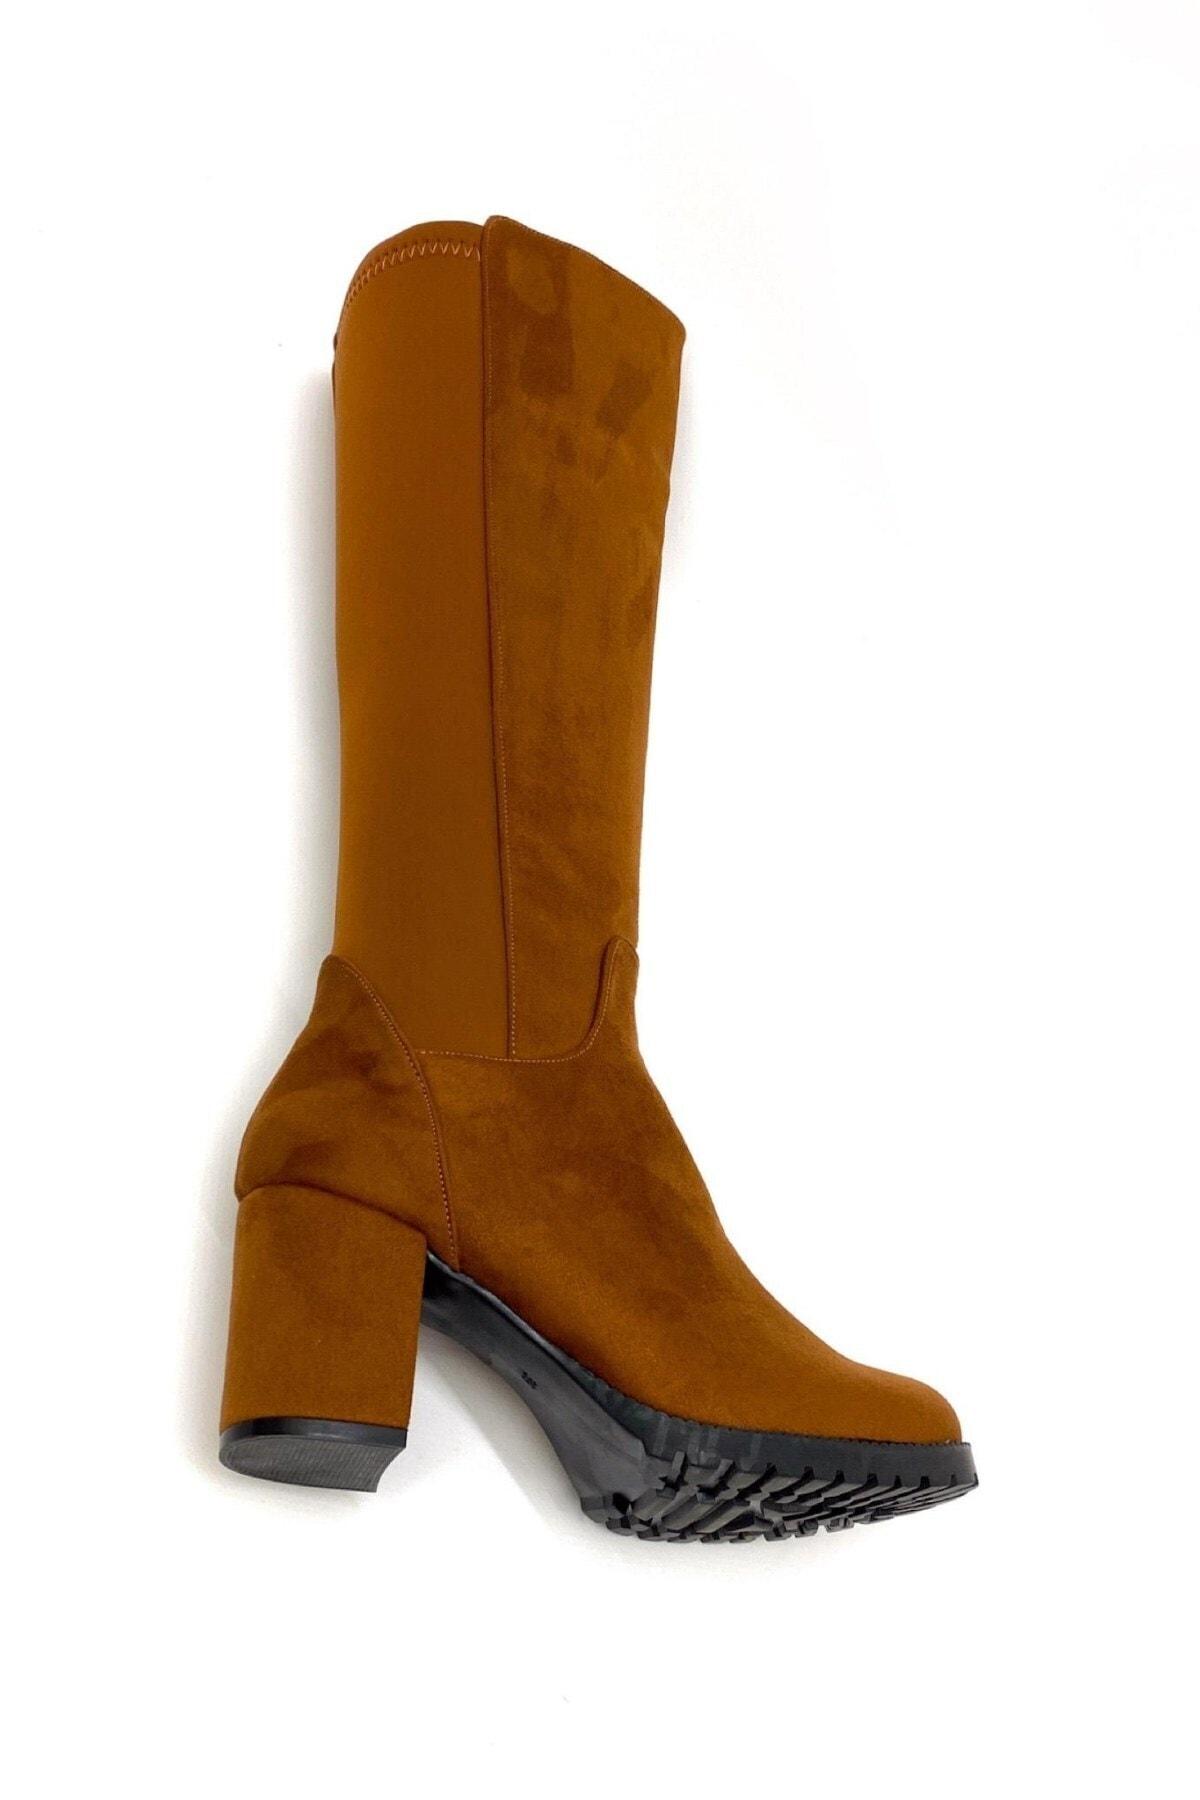 Stil Durağı 5 cm Topuklu Kalin Taban Sihirli Çizme Taba Suet 2